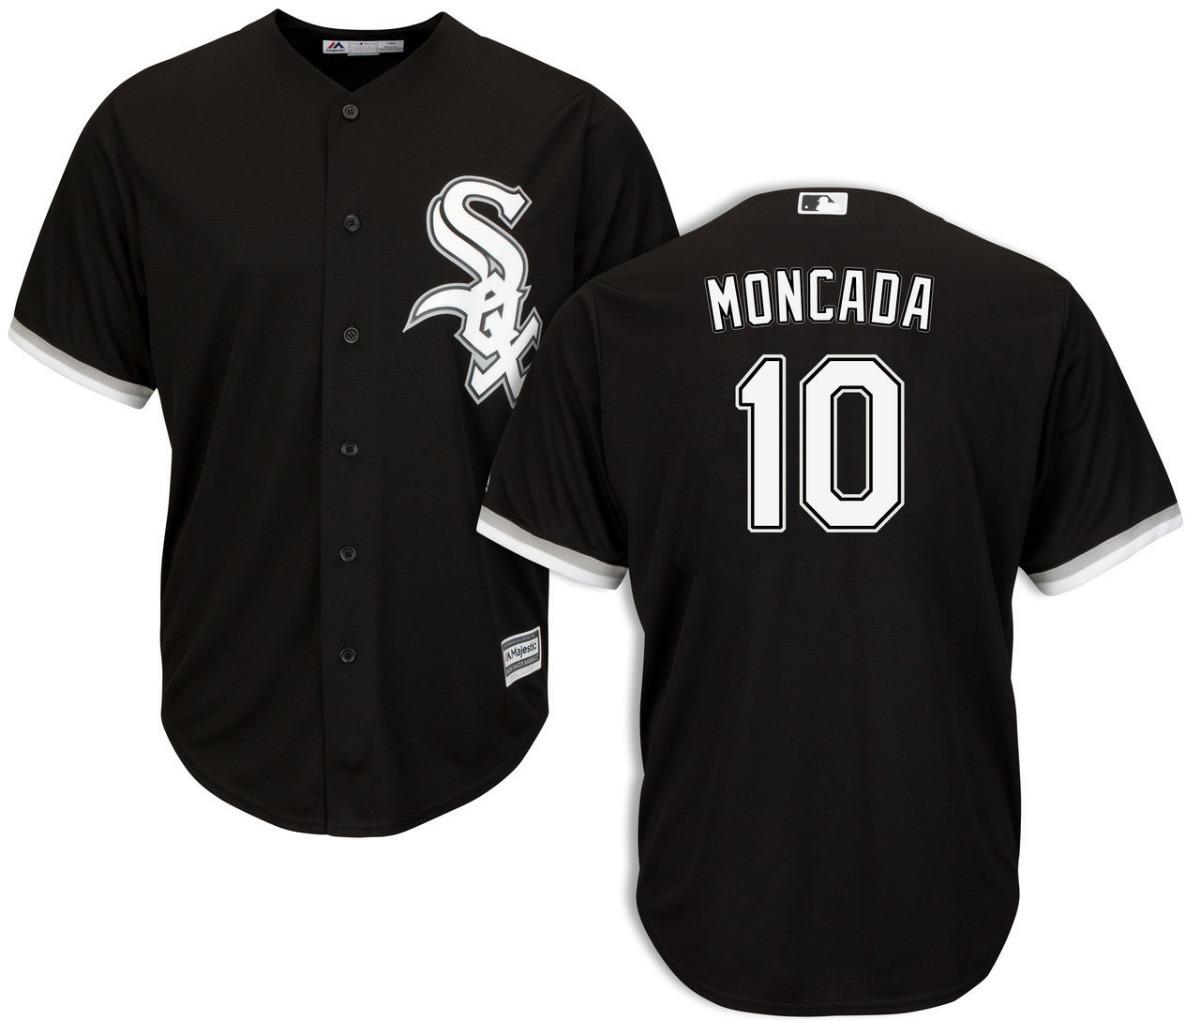 1bdcbe24c6afc camisa de baseball baisebol chicago white sox. Carregando zoom.